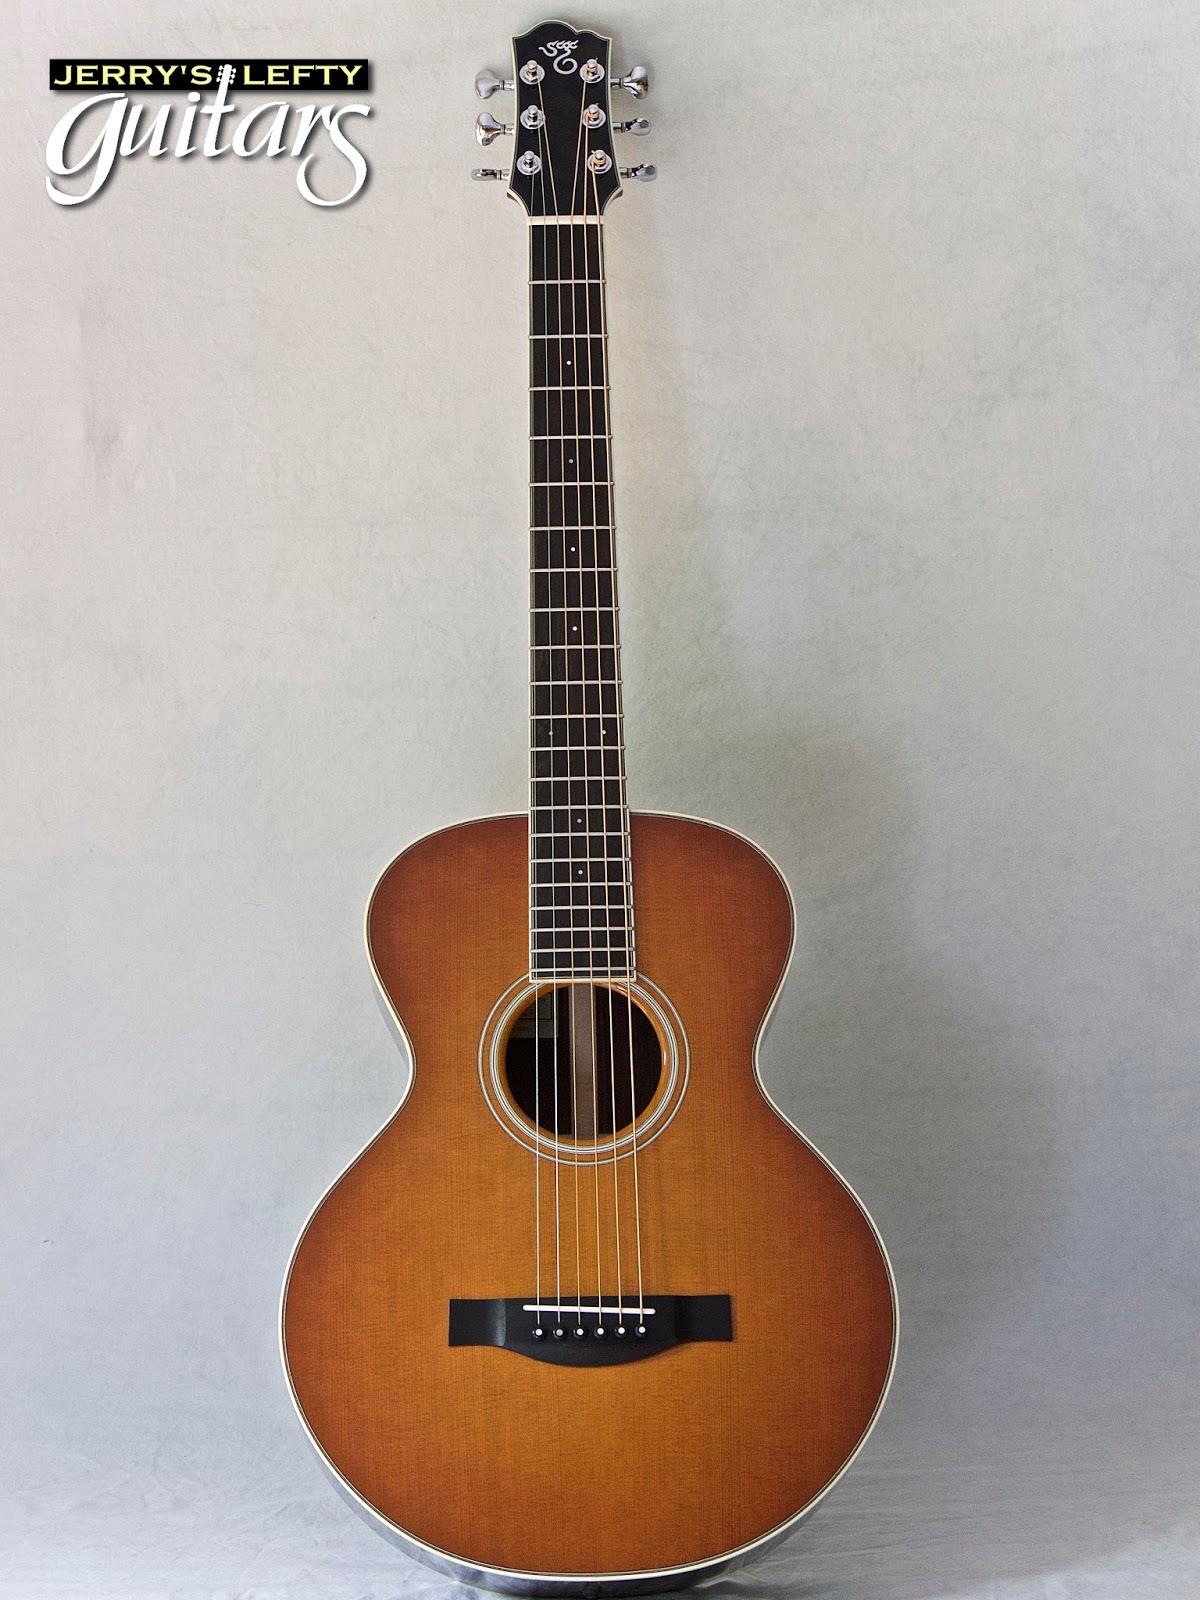 jerry 39 s lefty guitars newest guitar arrivals updated weekly santa cruz firefly left handed. Black Bedroom Furniture Sets. Home Design Ideas